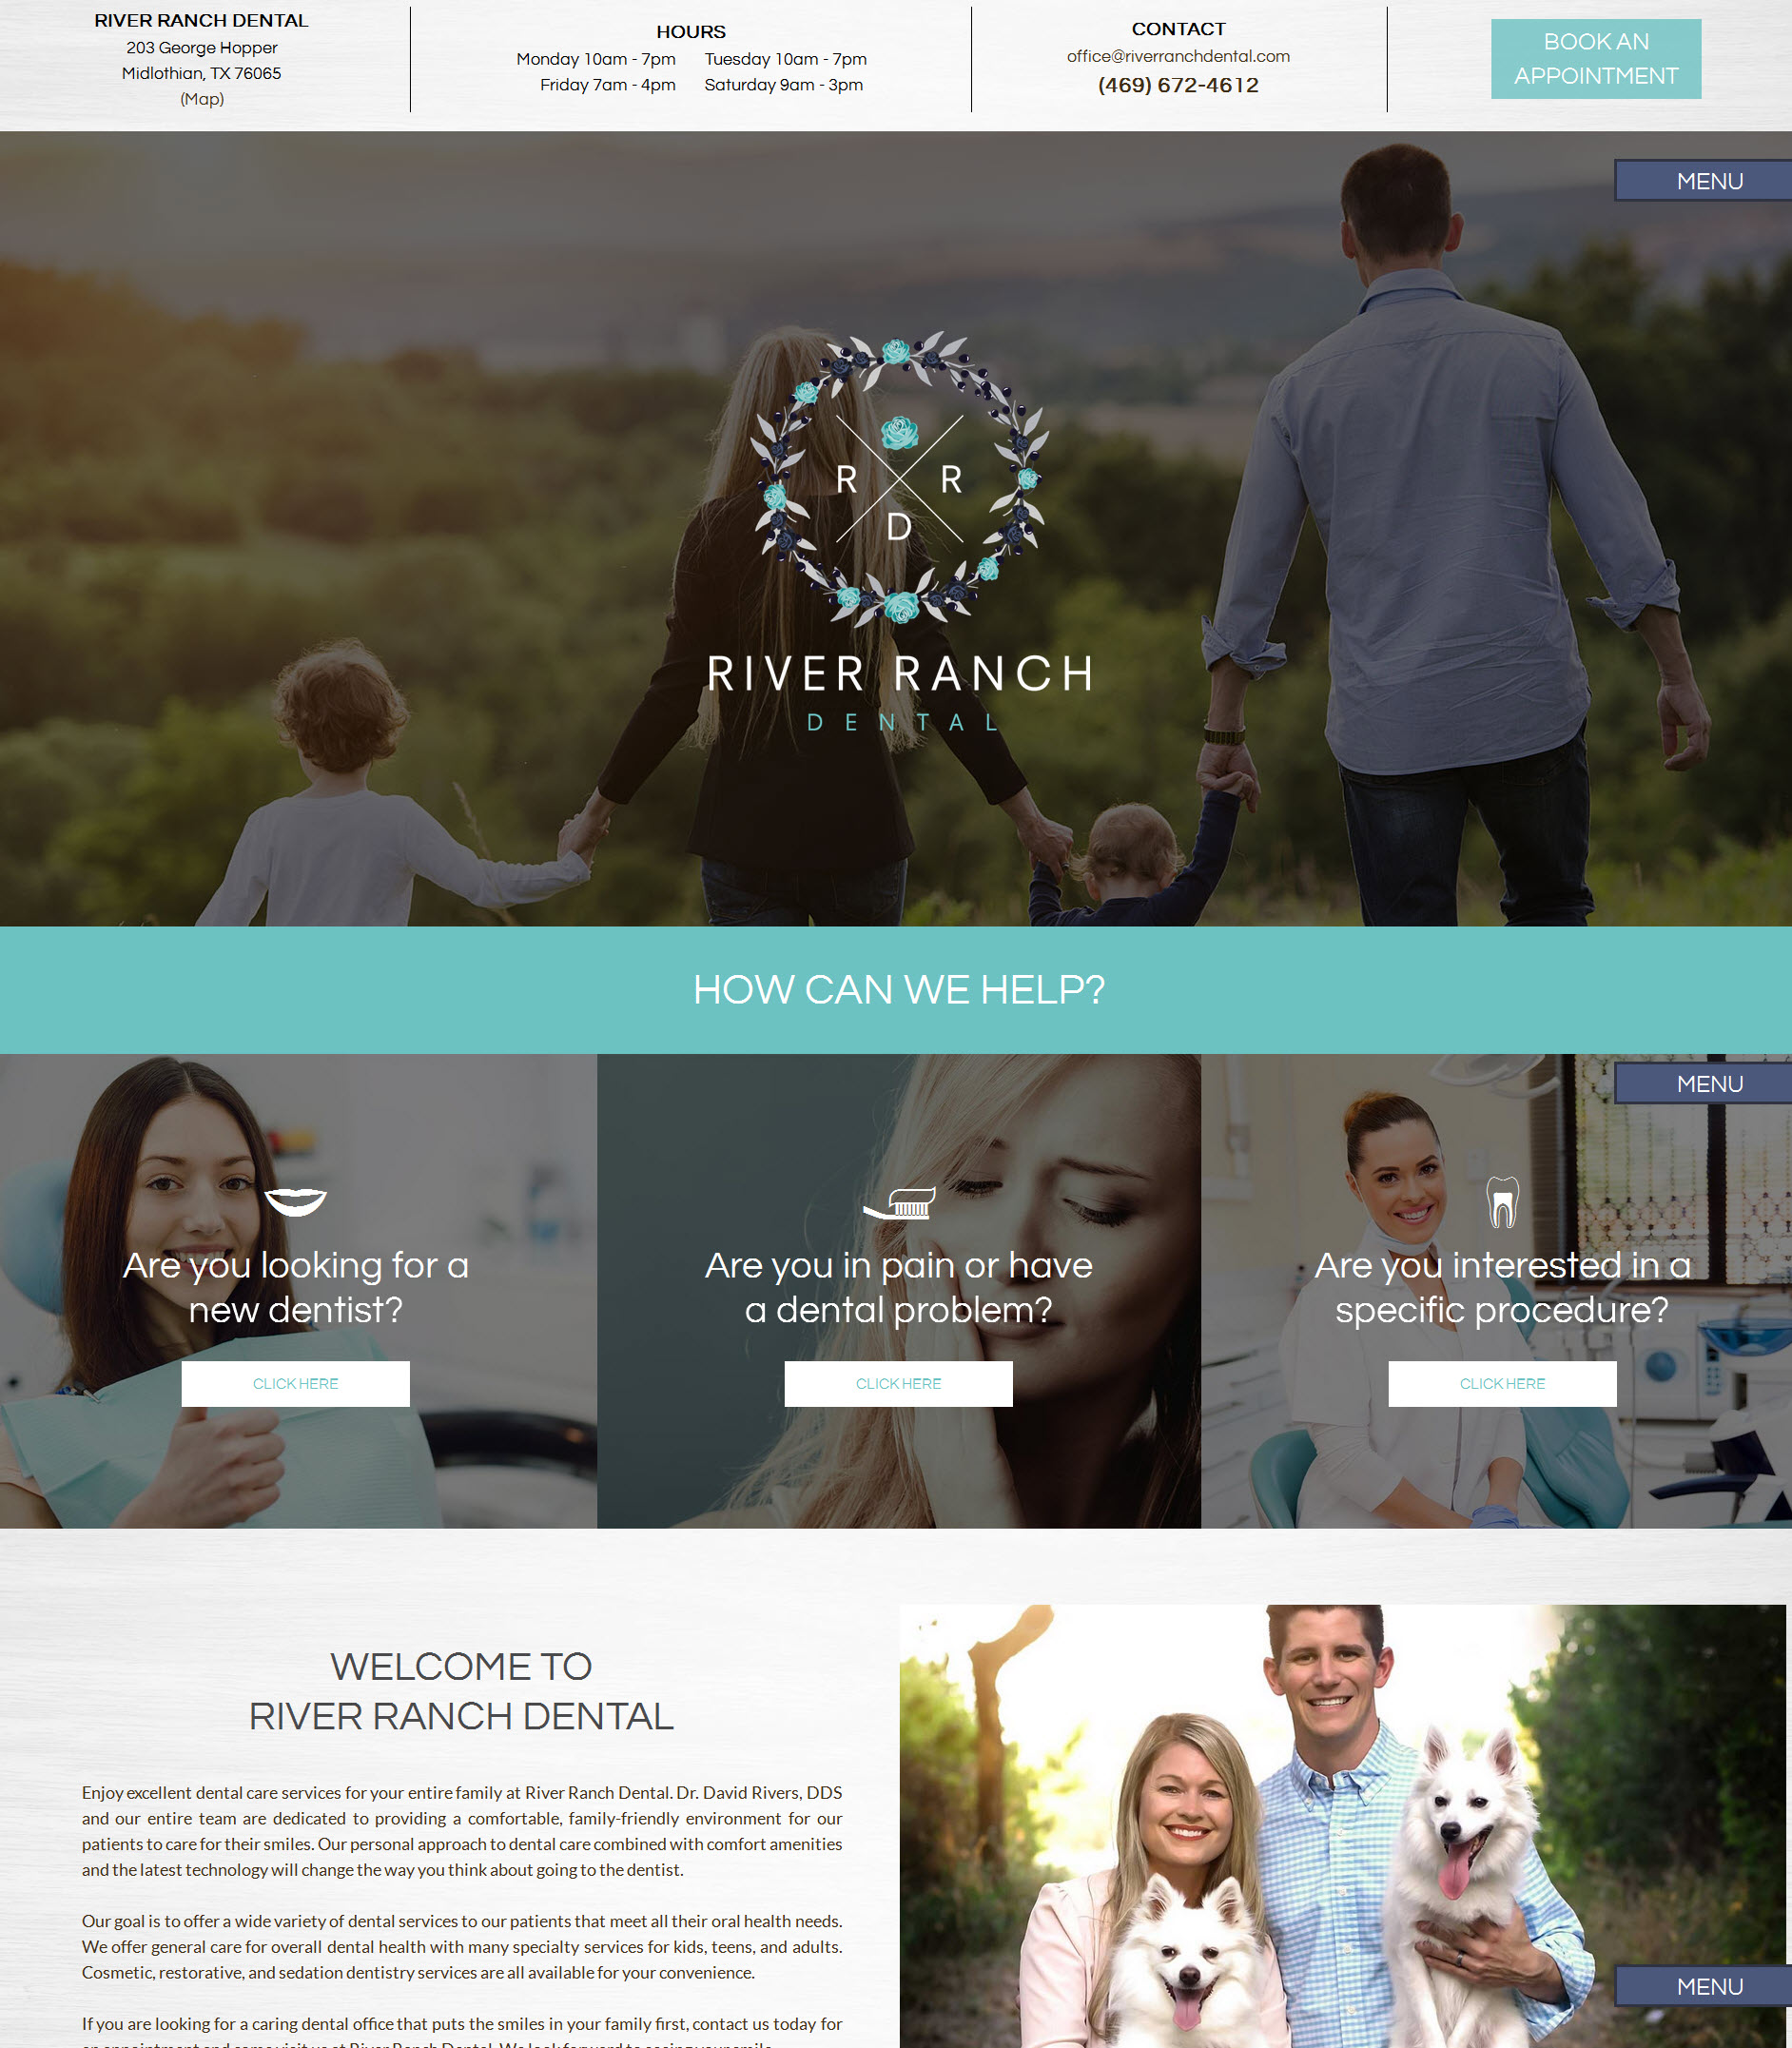 River Ranch Dental Opens in Midlothian Texas